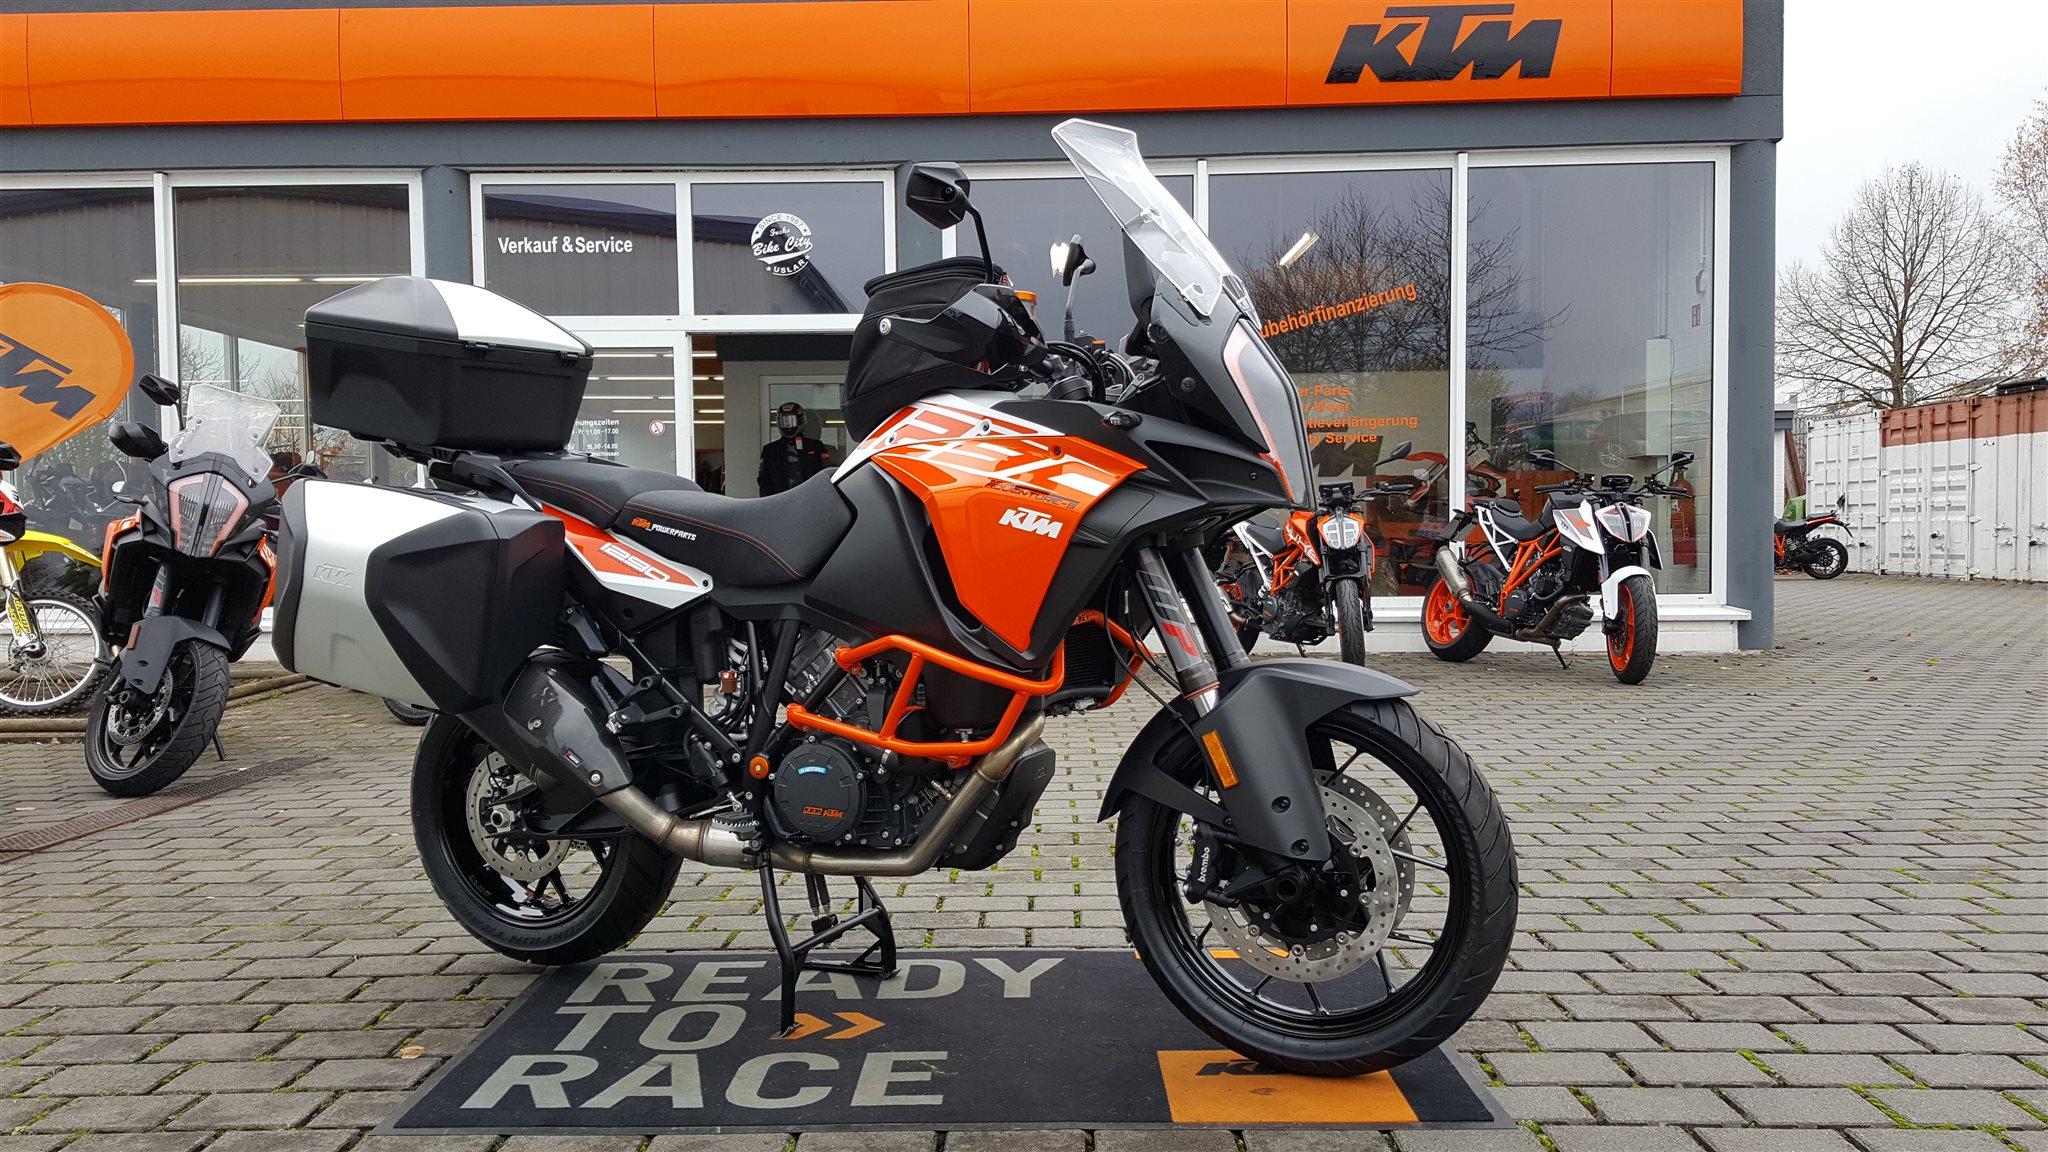 umgebautes motorrad ktm 1290 super adventure s von biker s. Black Bedroom Furniture Sets. Home Design Ideas